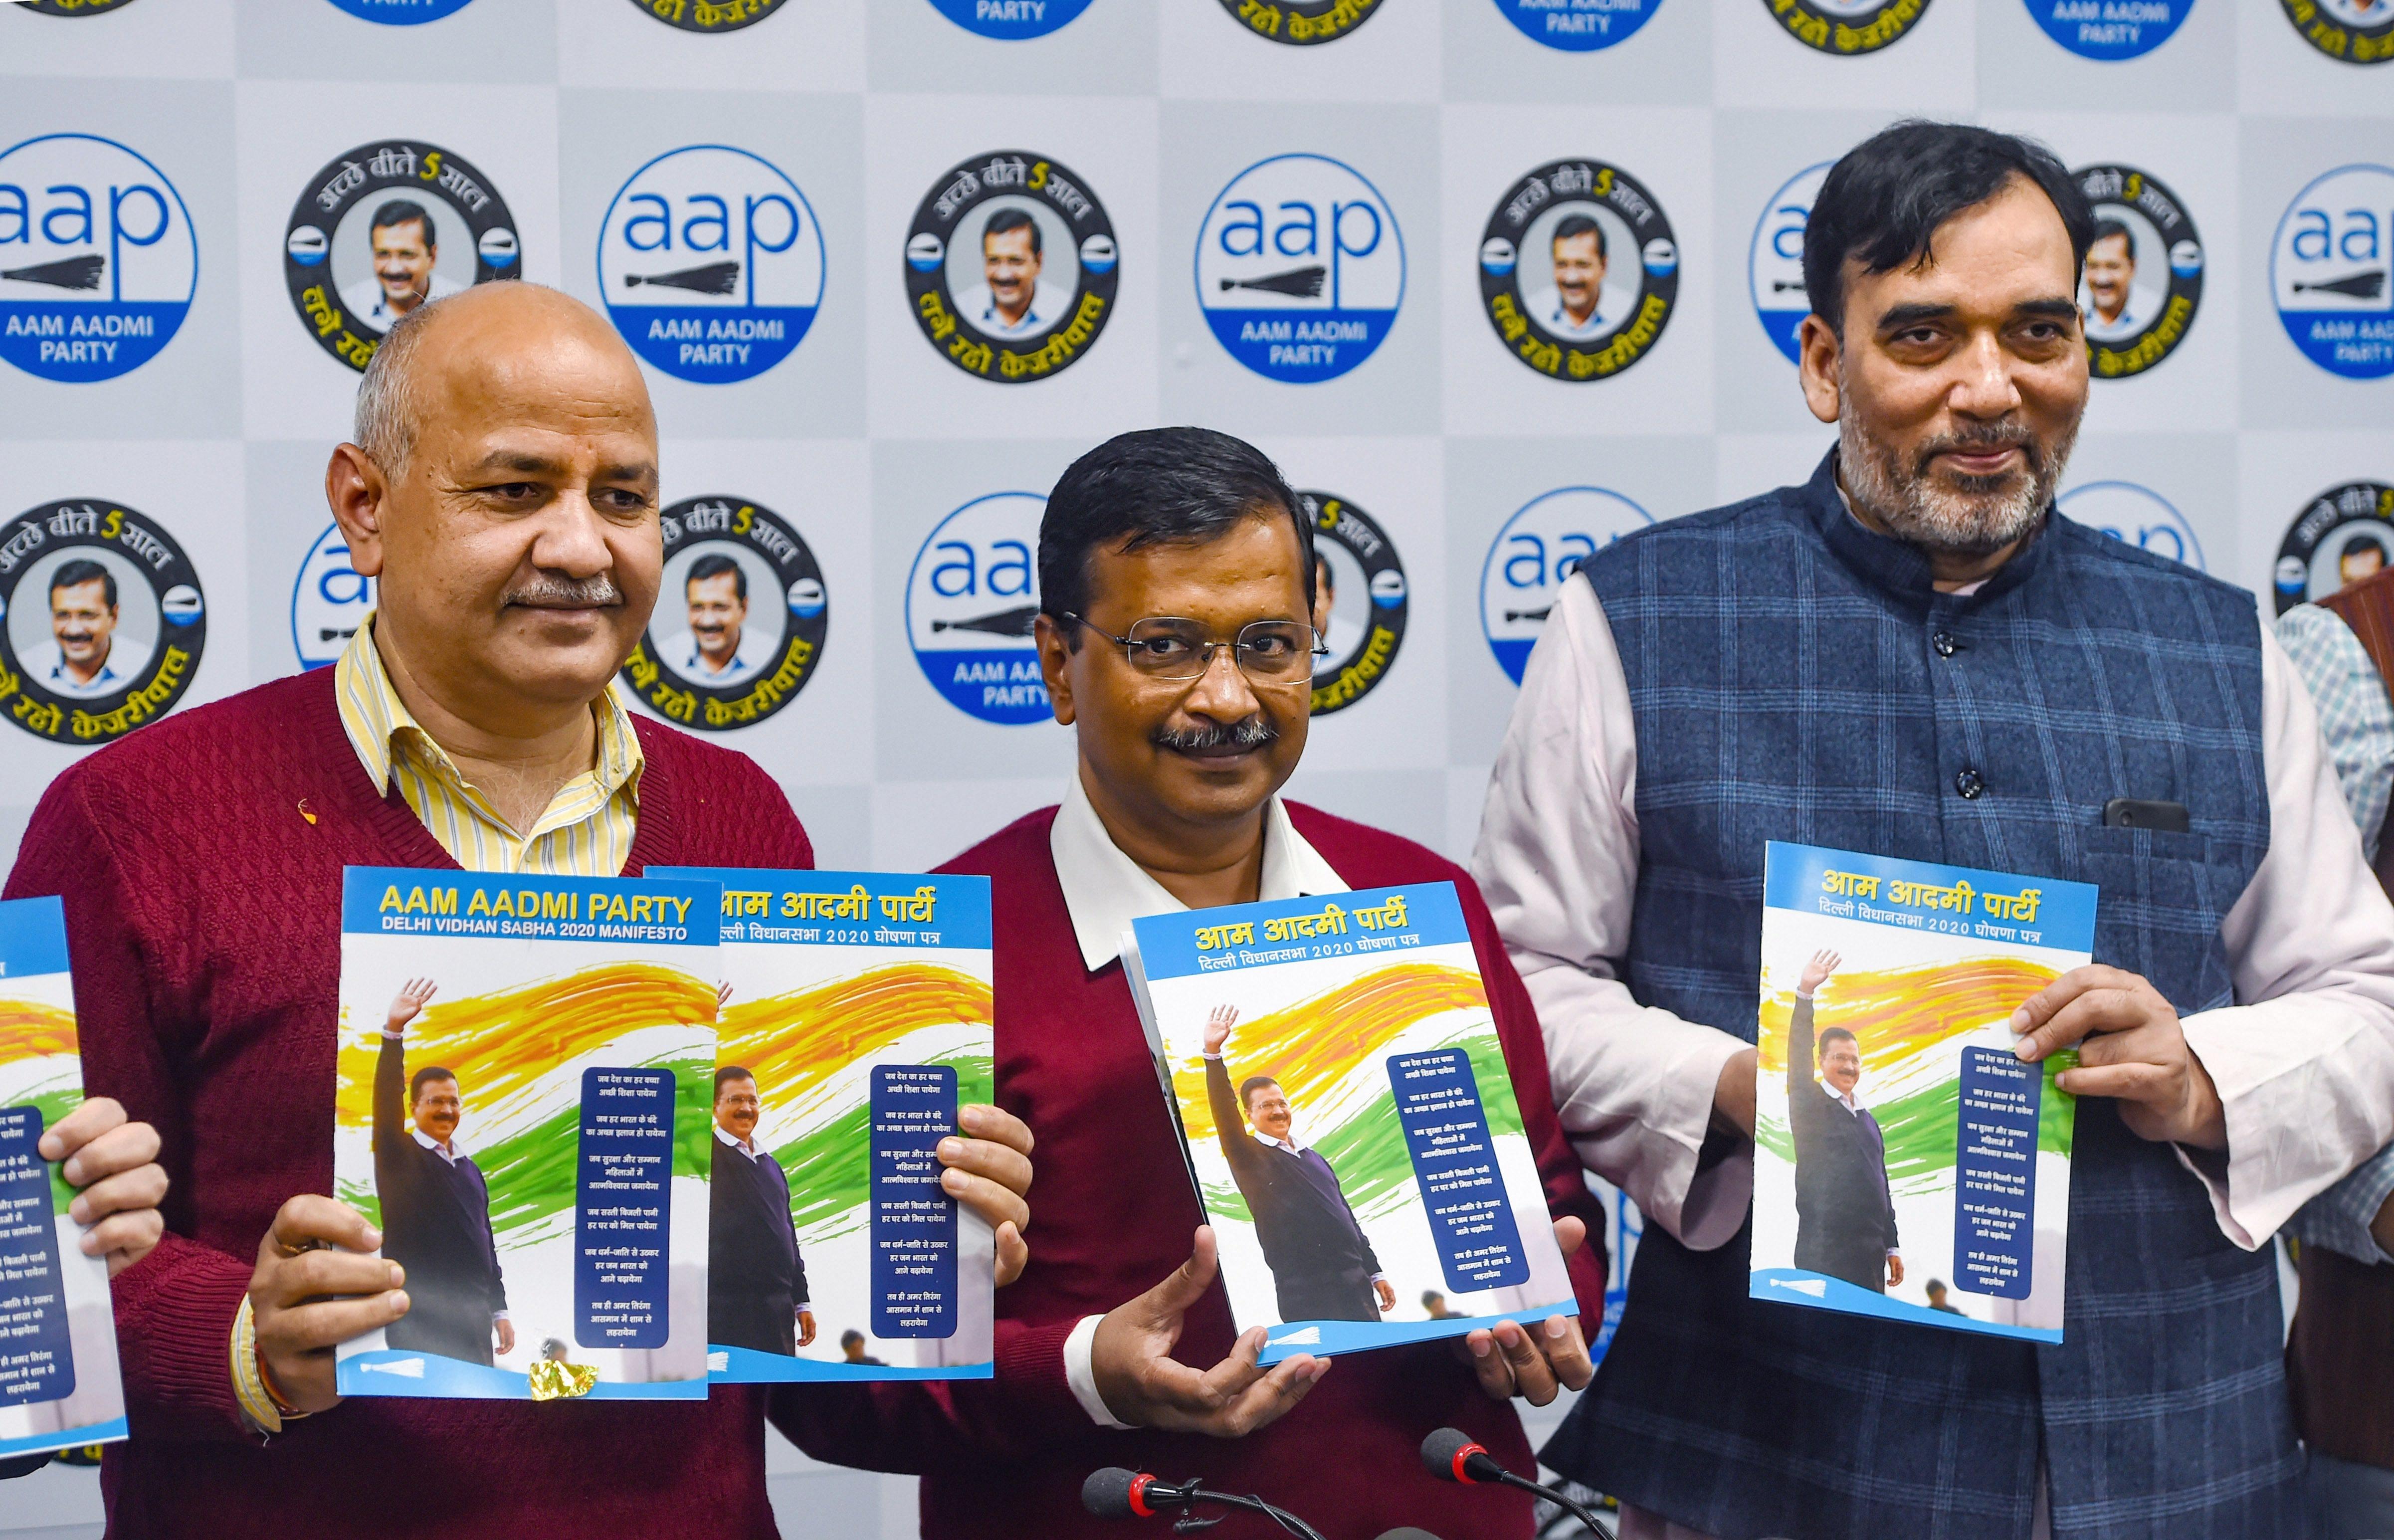 Aam Aadmi Party manifesto sticks to Delhi, slips in 'deshbhakti' course